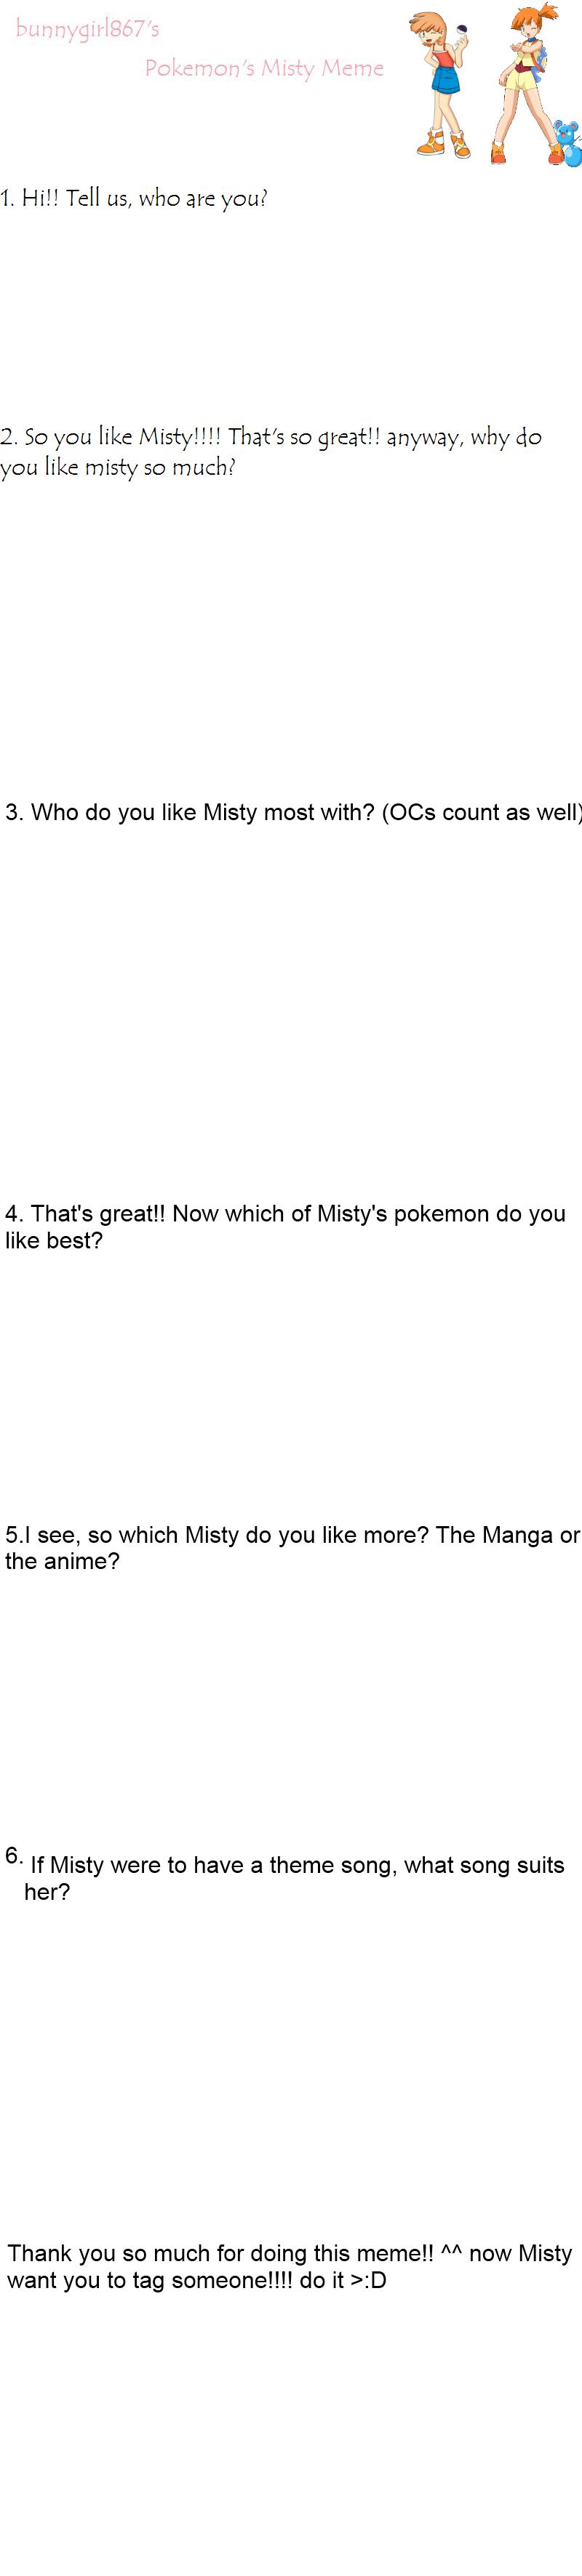 pokemon speed dating meme blank